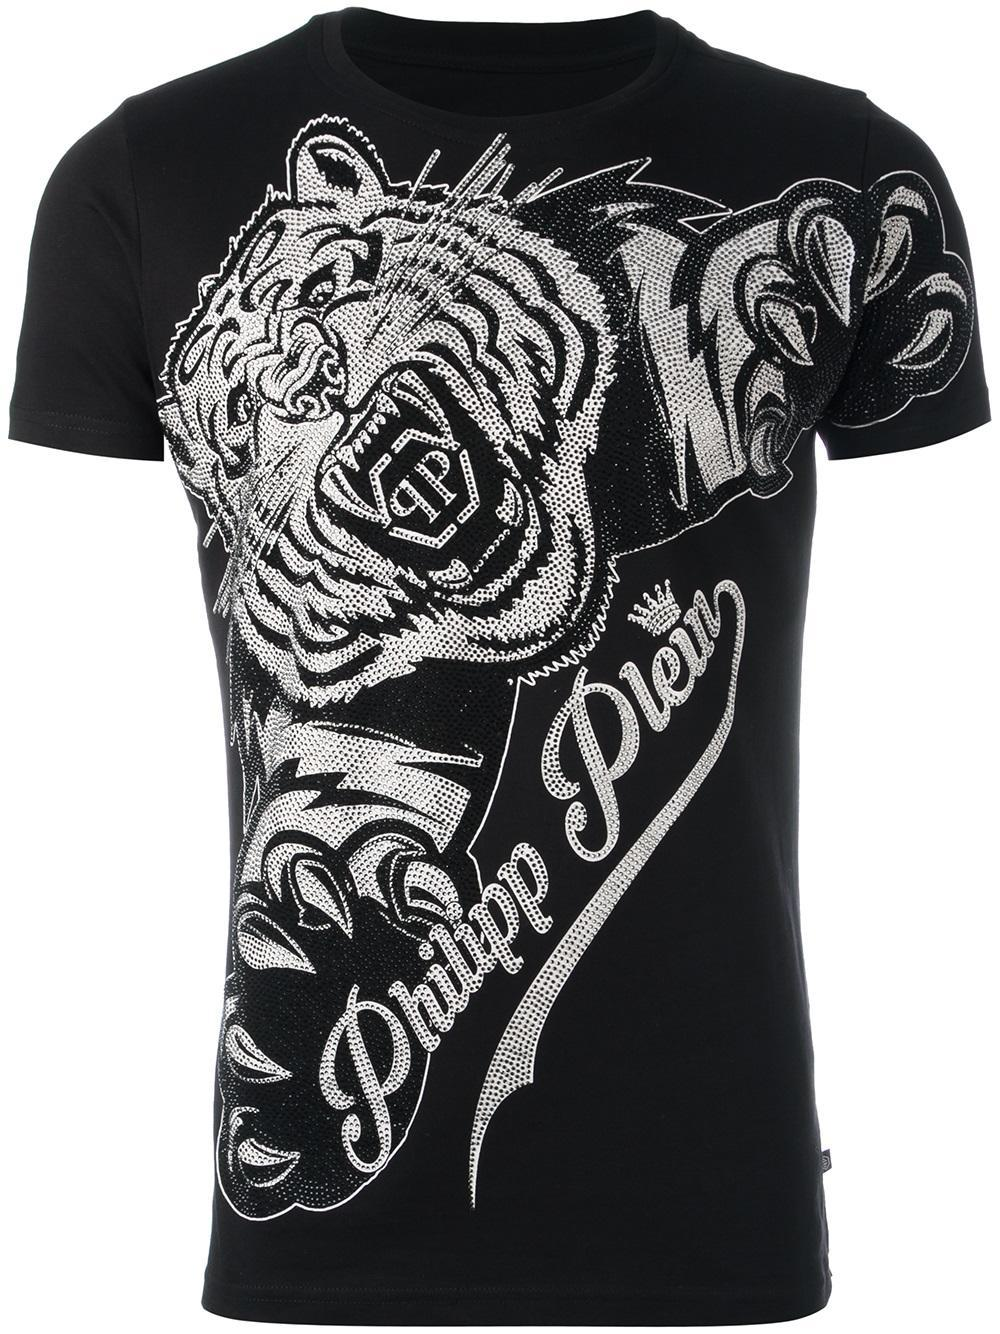 lyst philipp plein 39 claws 39 t shirt in black for men. Black Bedroom Furniture Sets. Home Design Ideas